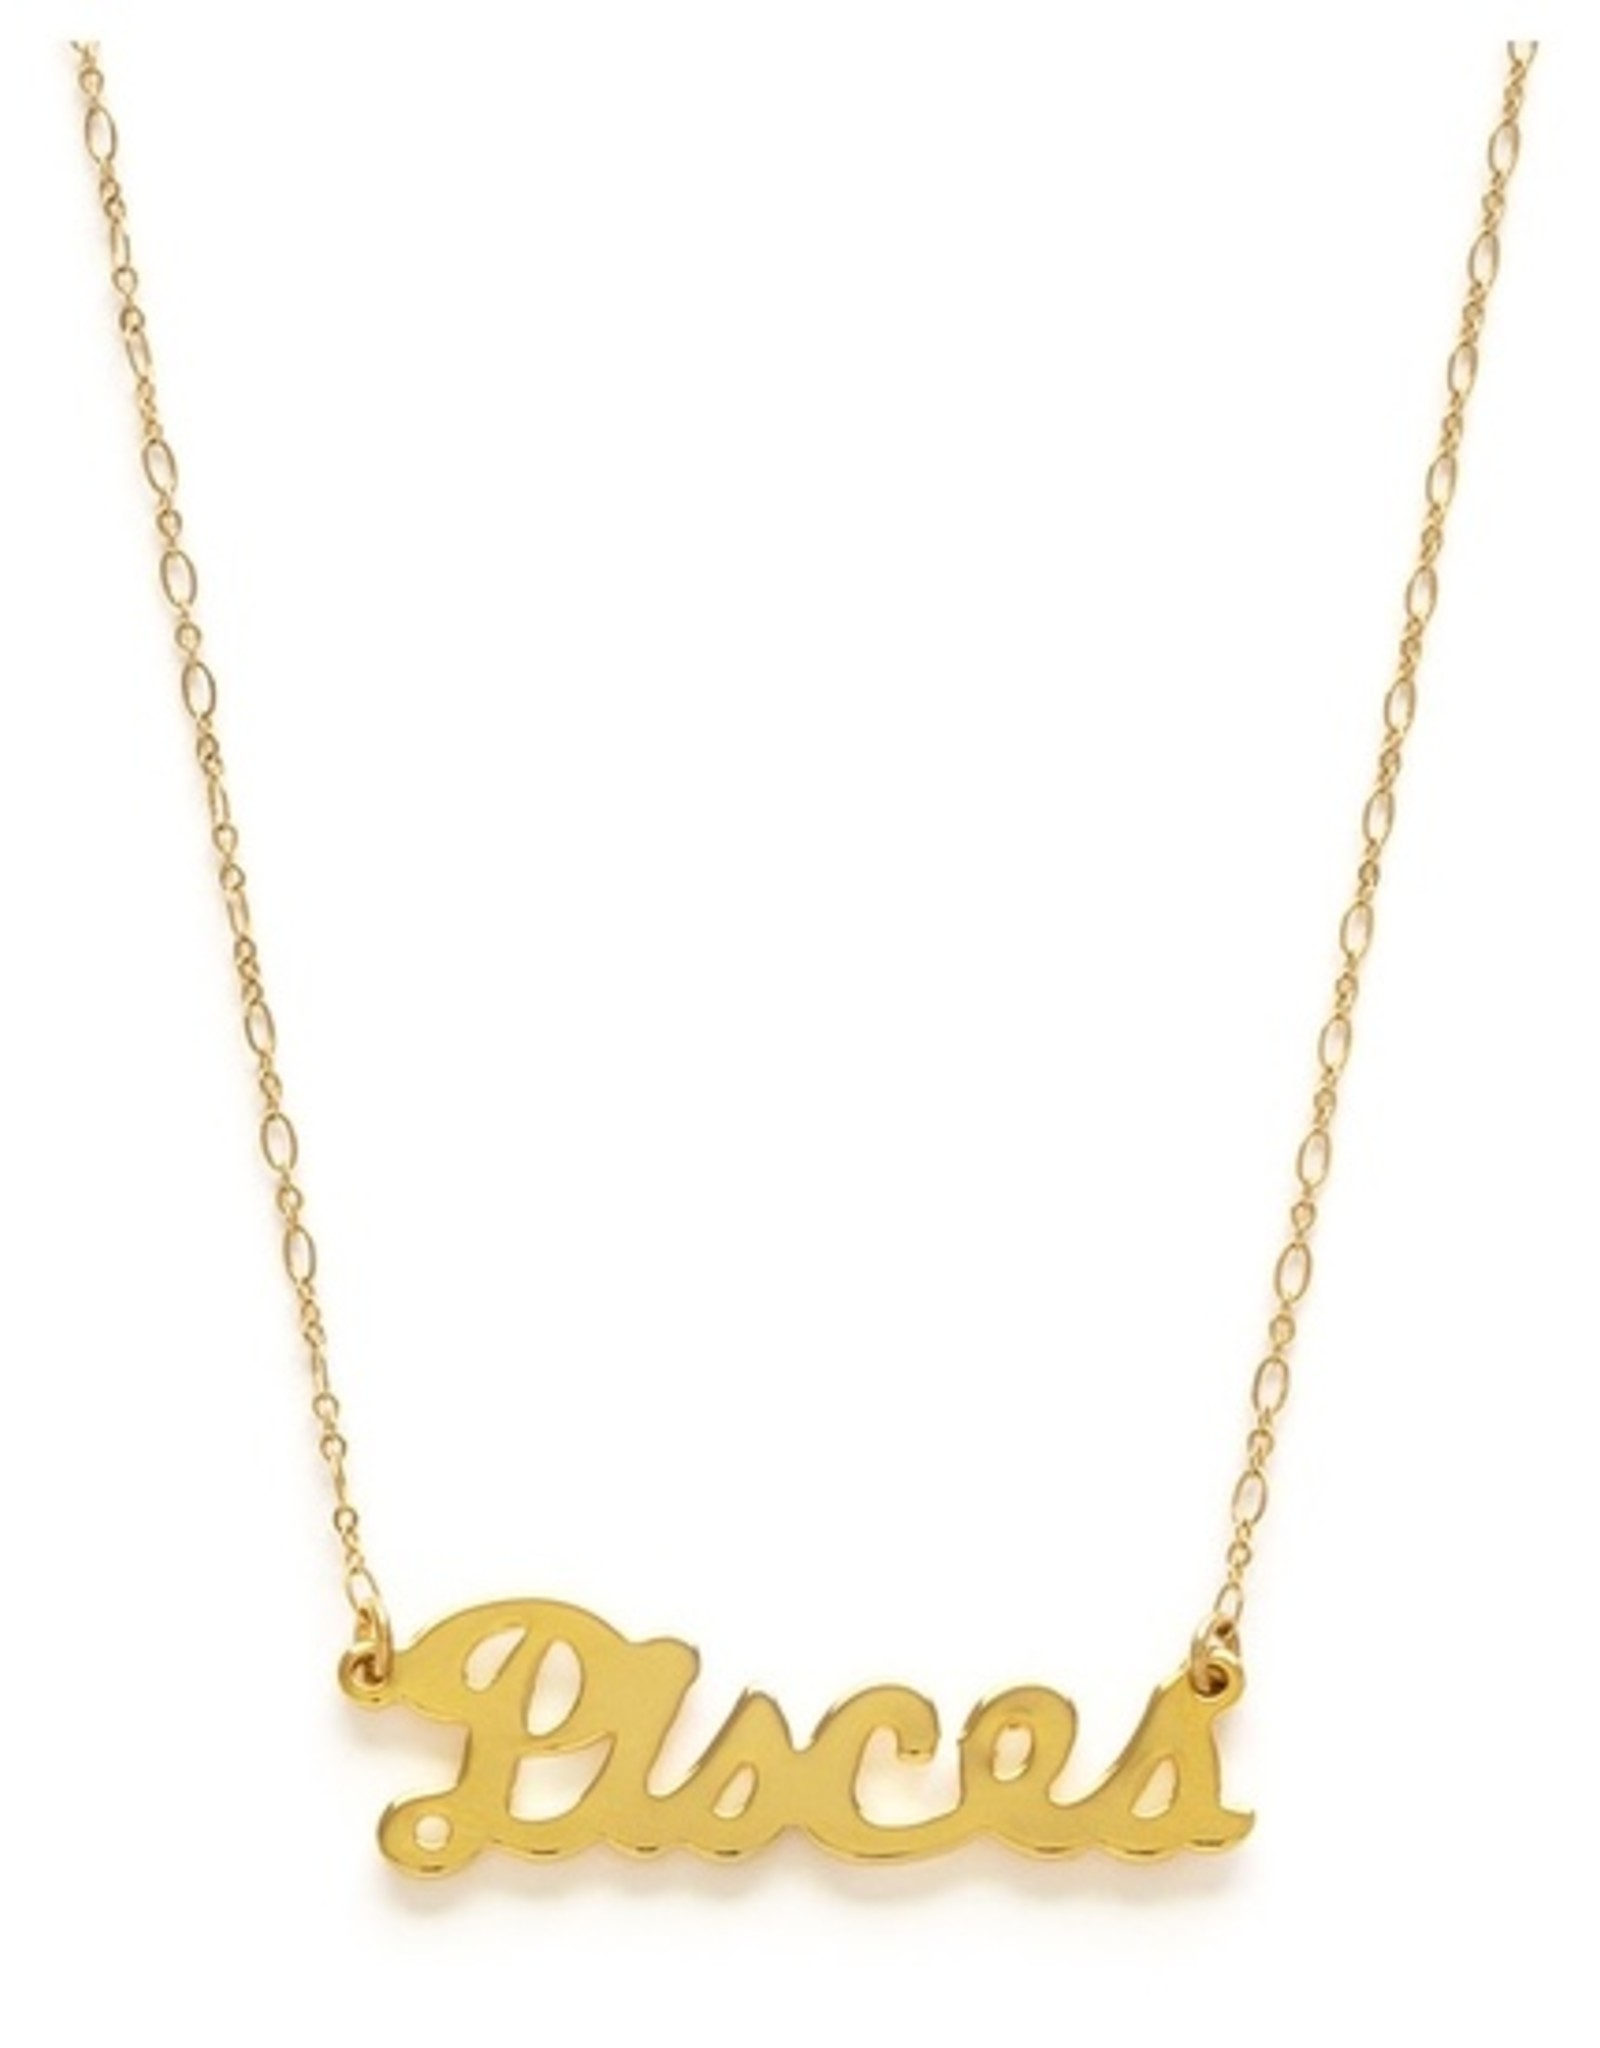 Amano Studio Pisces Necklace